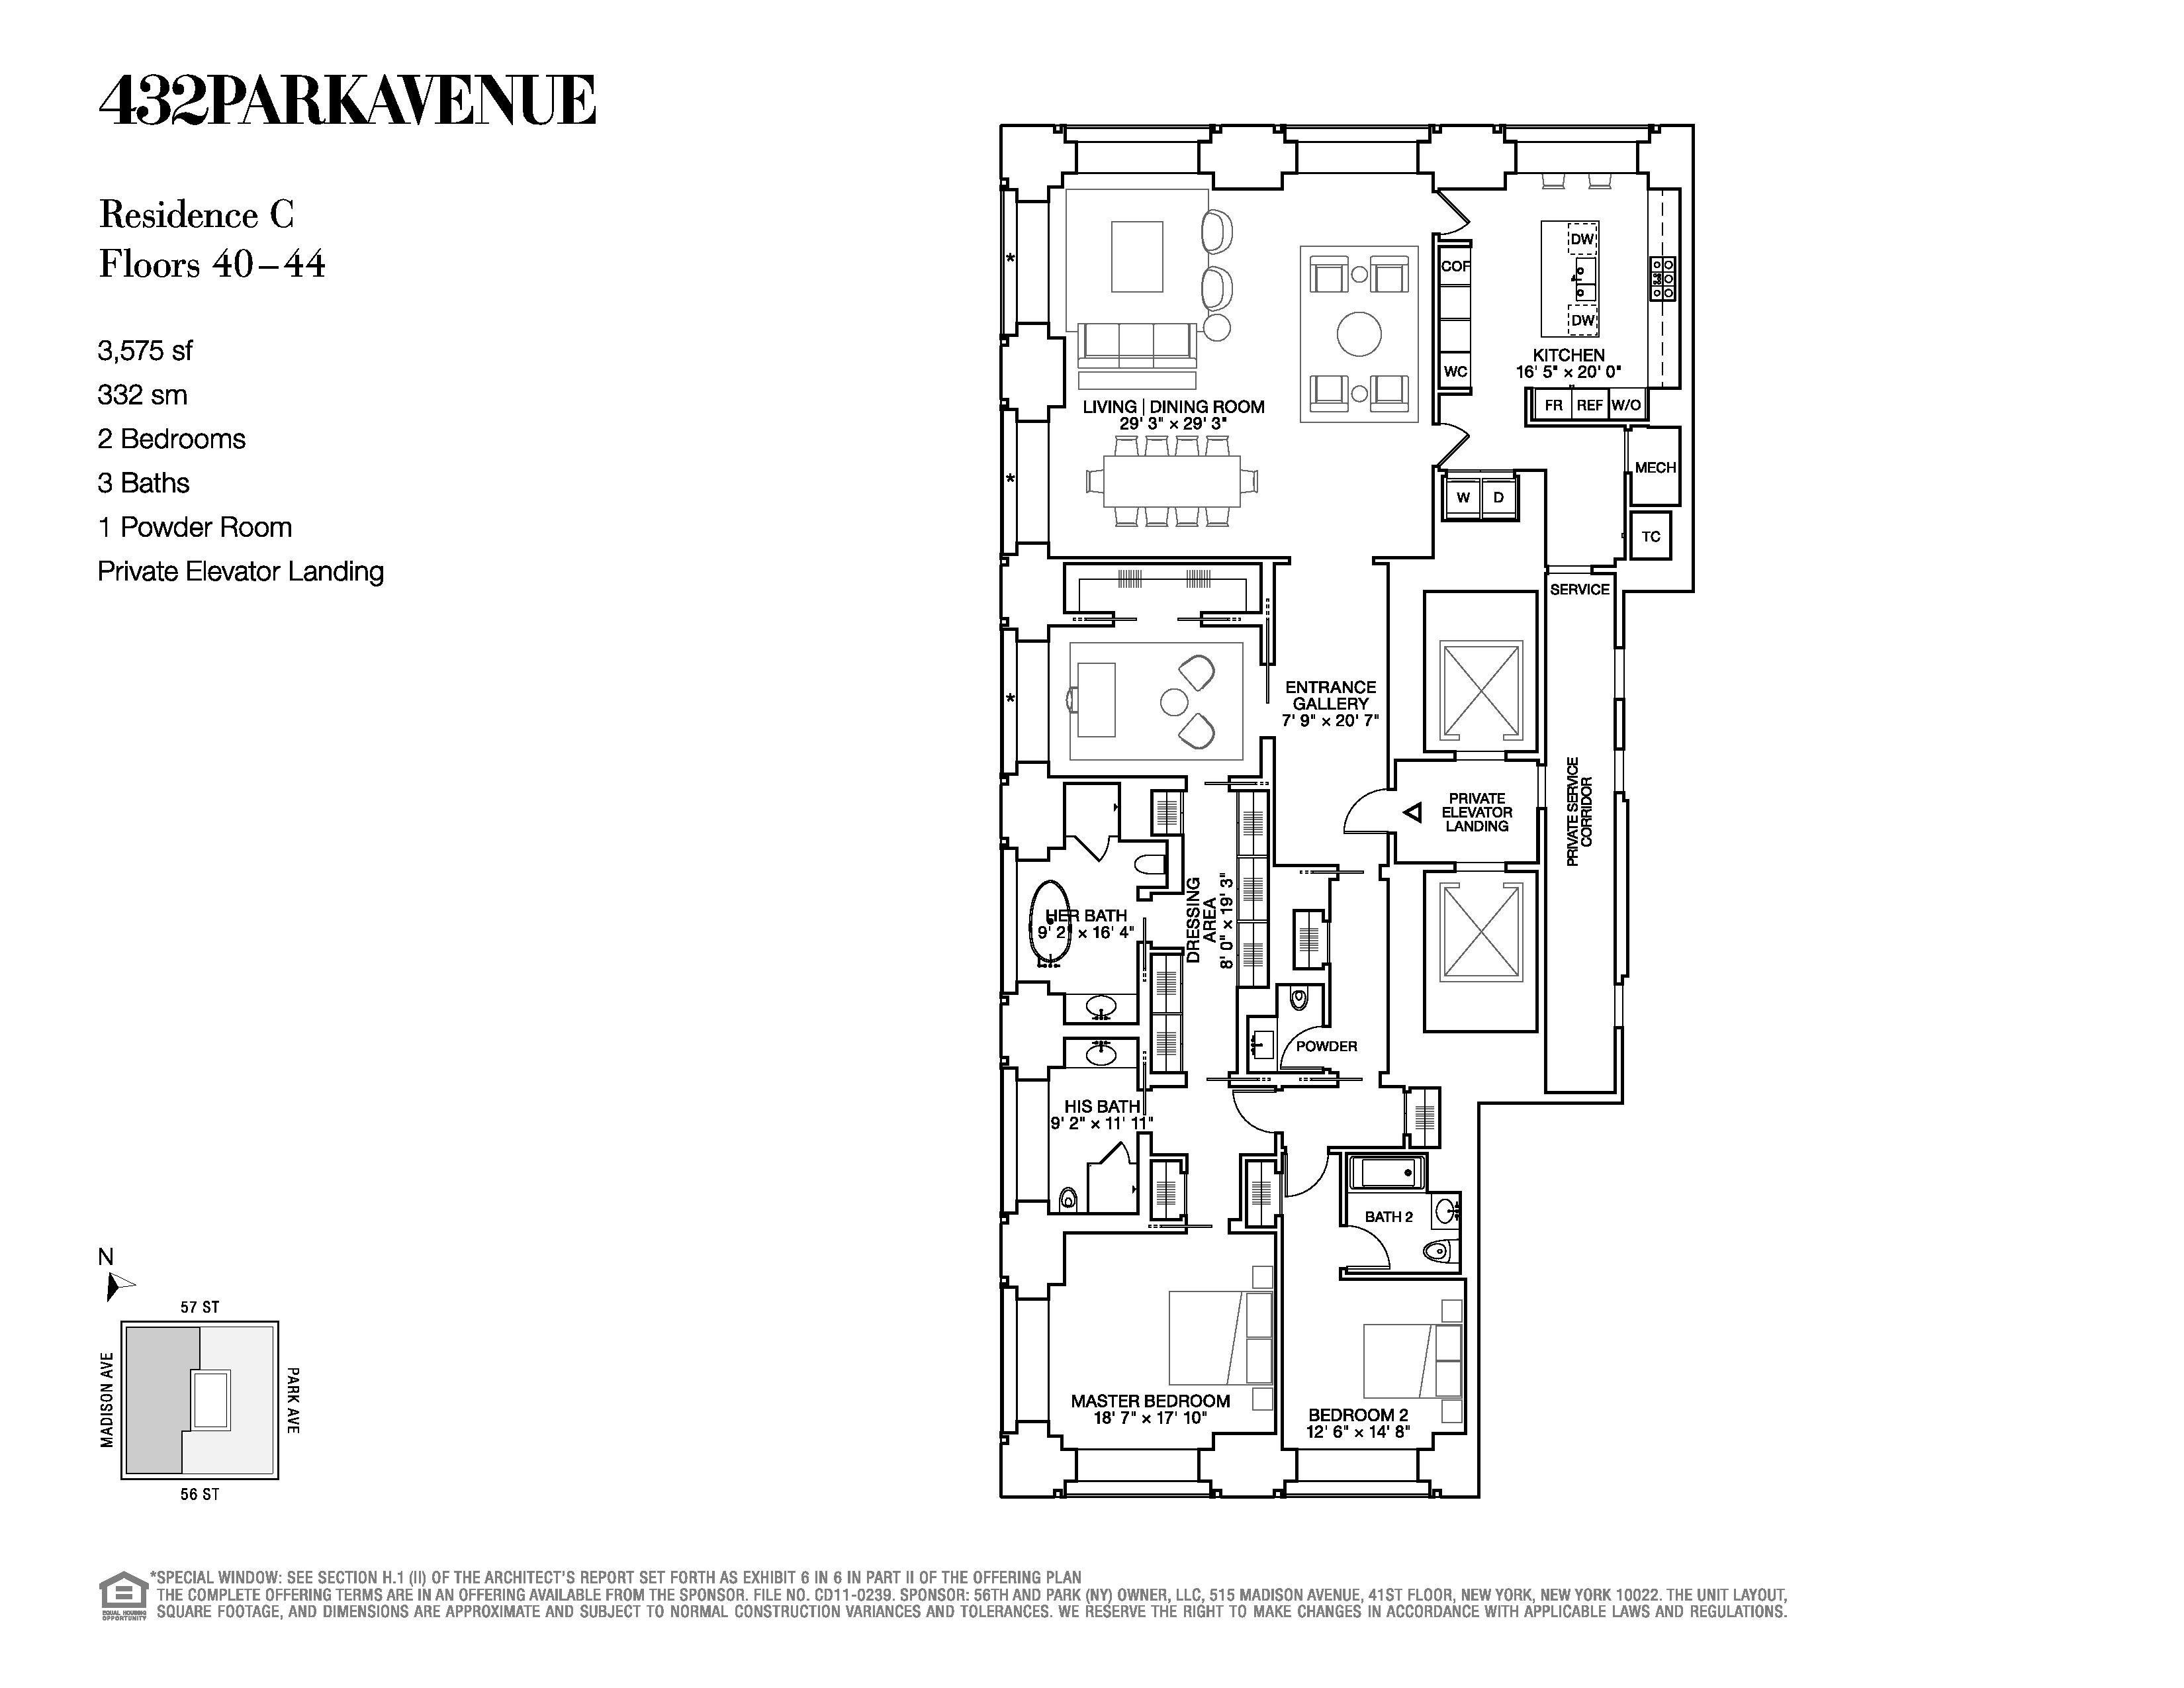 432 park avenue floor plans new york usa floor plans